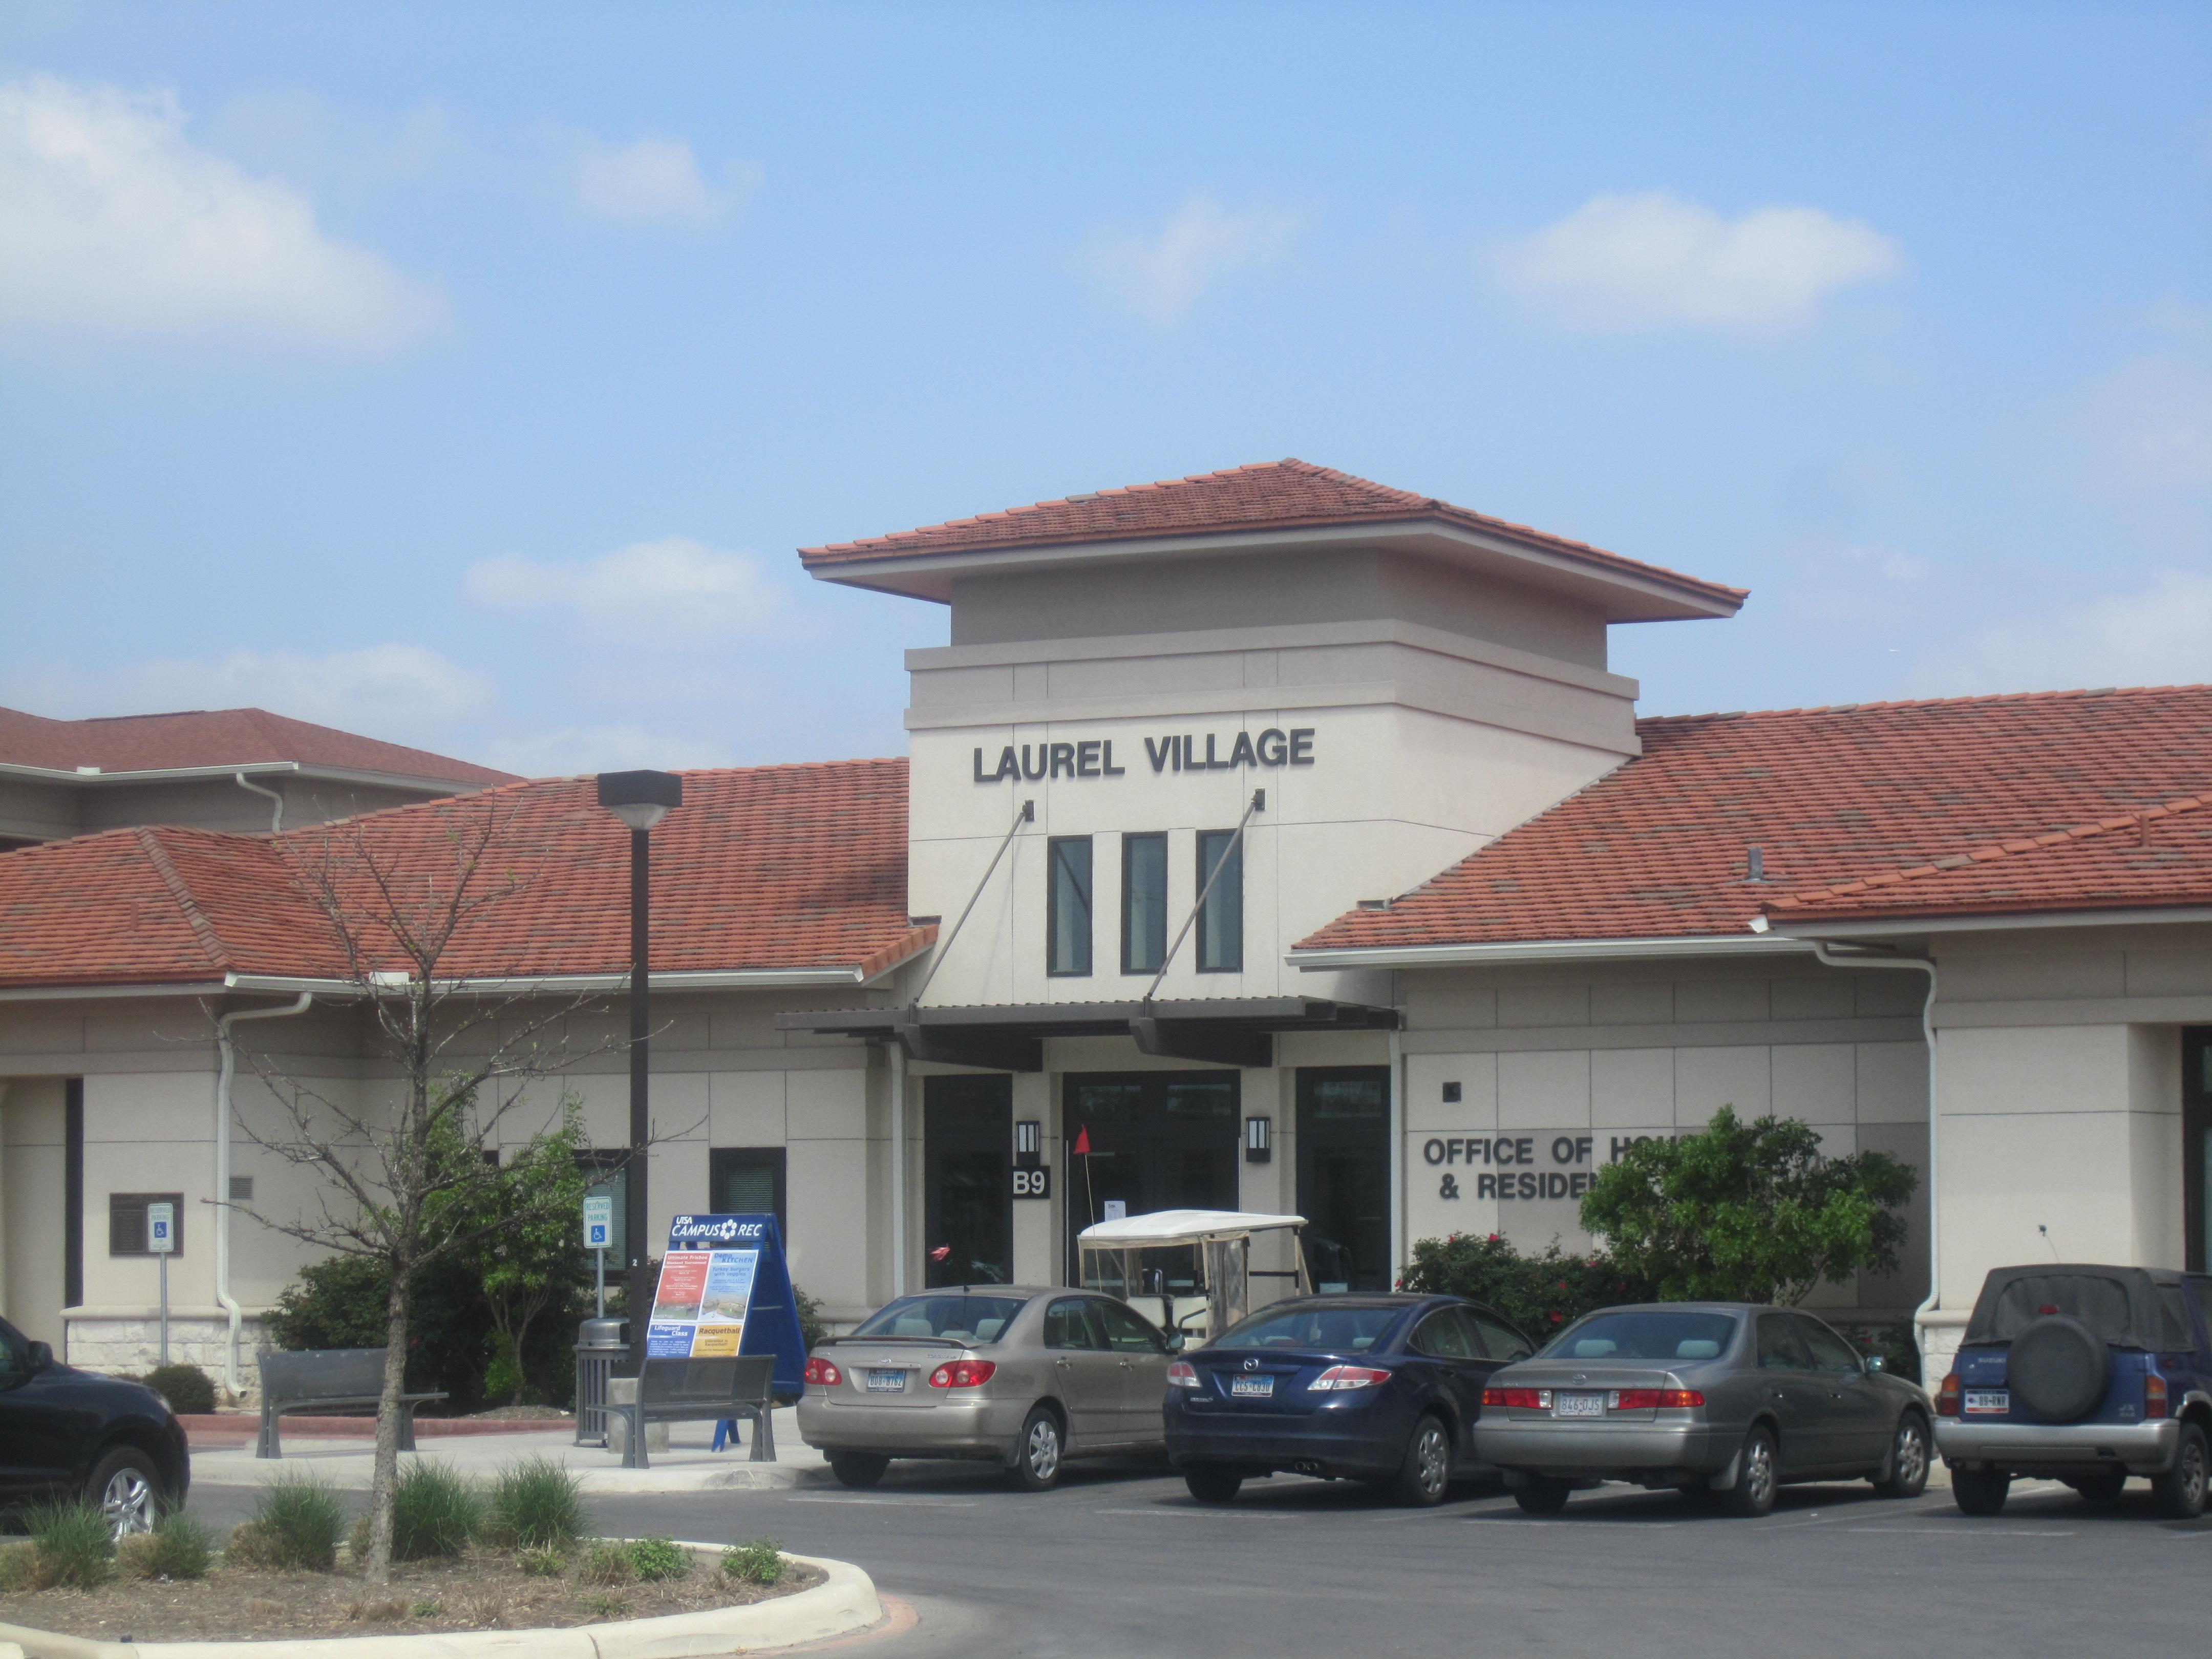 File:Laurel Village housing office, UTSA, San Antonio, TX ...